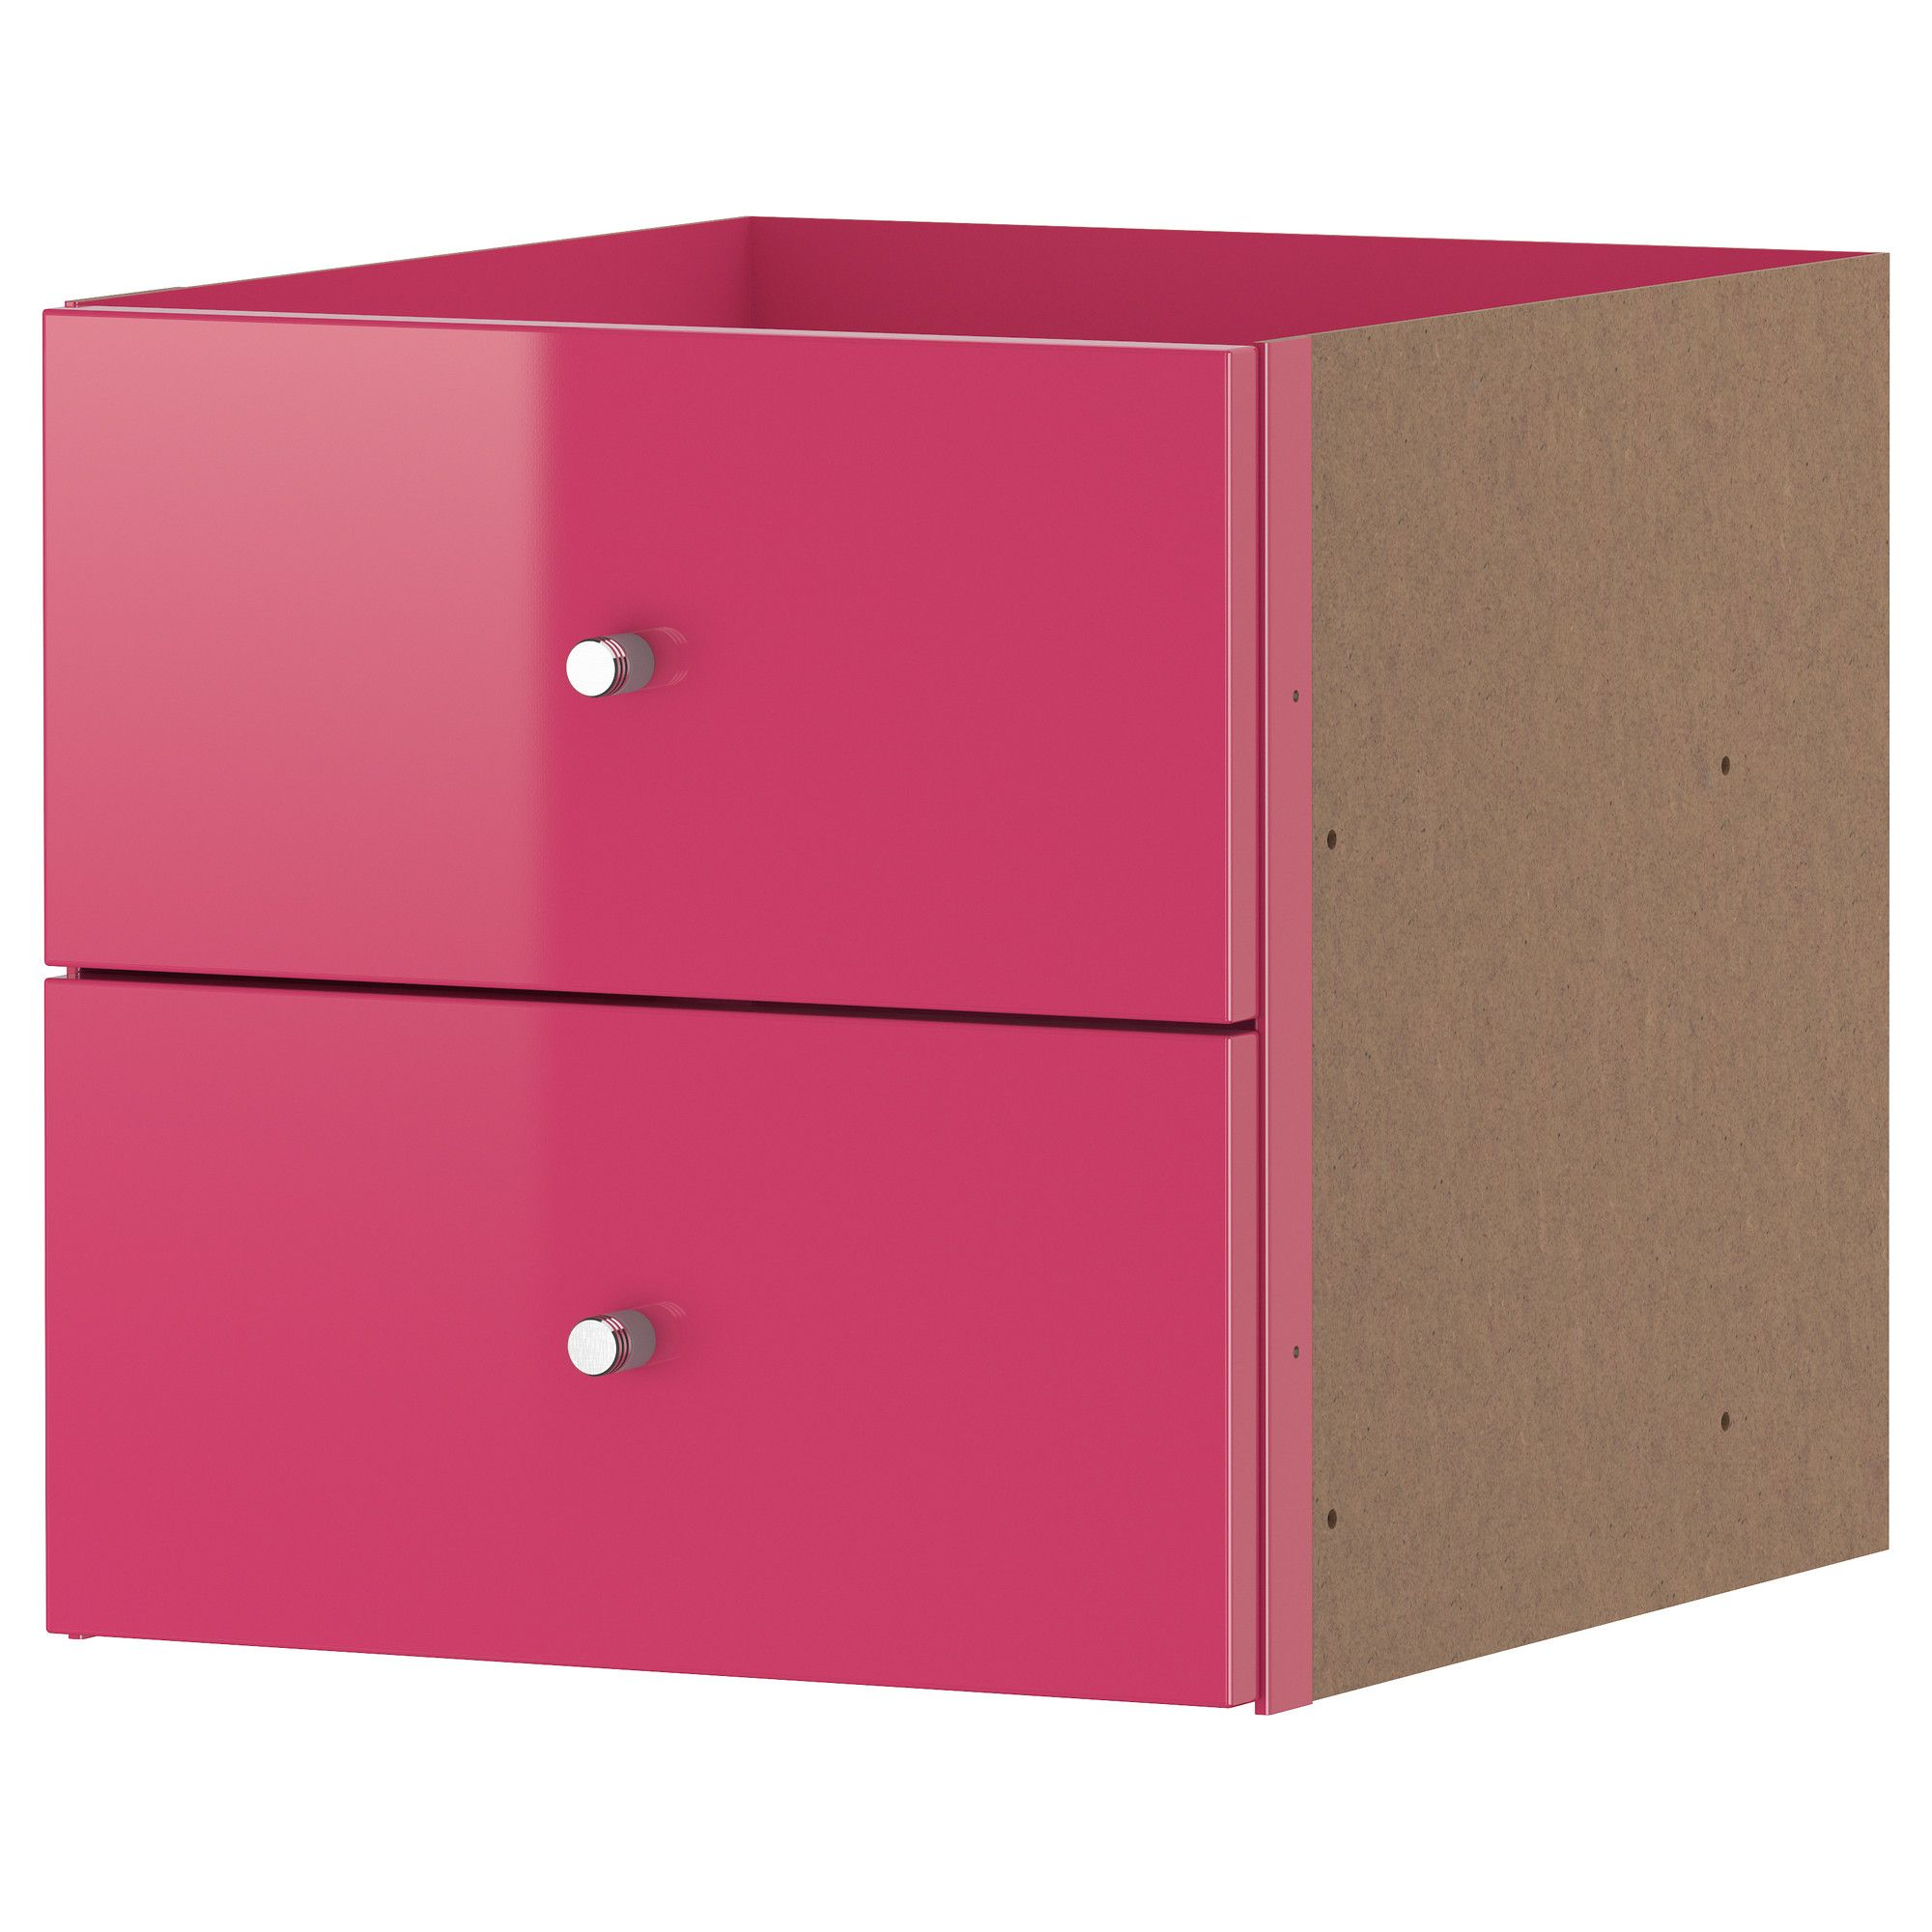 expedit casier 2 tiroirs ultrabrillant rose ikea bureau de travail pinterest high. Black Bedroom Furniture Sets. Home Design Ideas